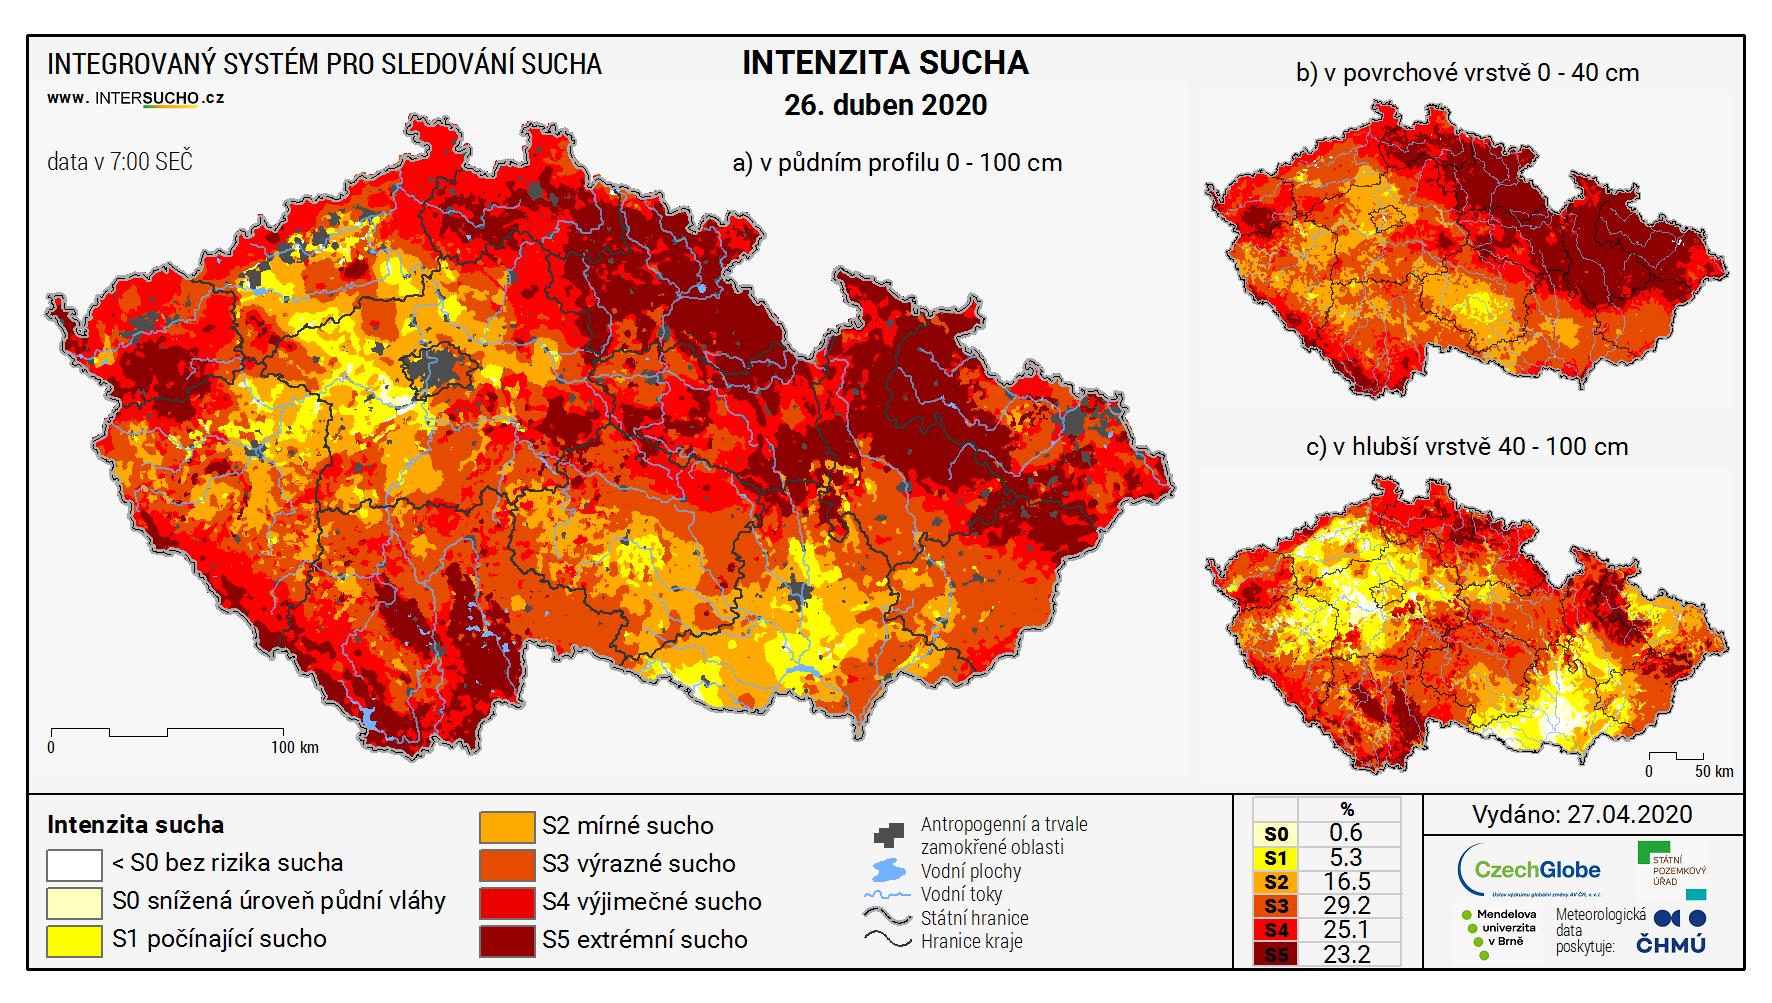 Mapa intenzity sucha v České republice. Zdroj: Intersucho